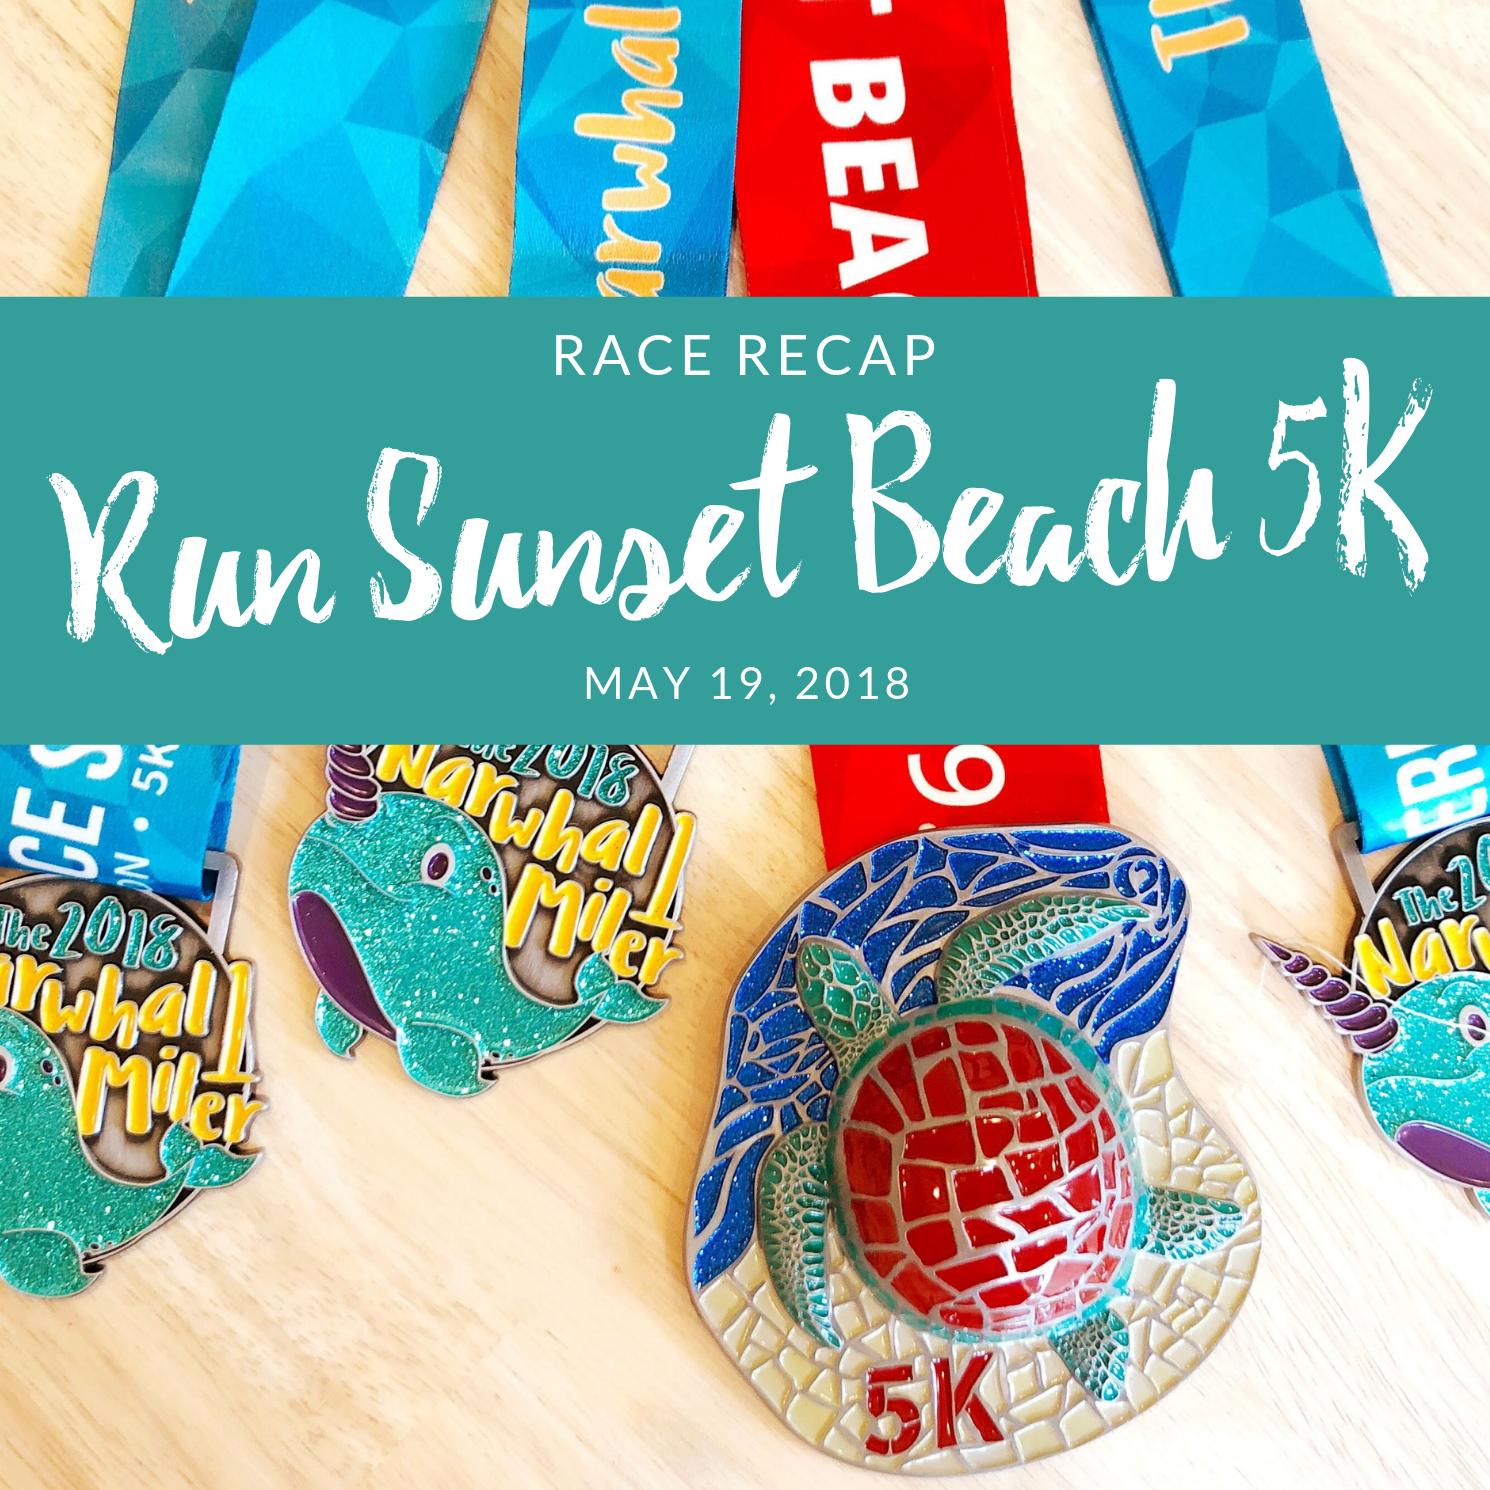 Race Recap Run Sunset Beach 5K